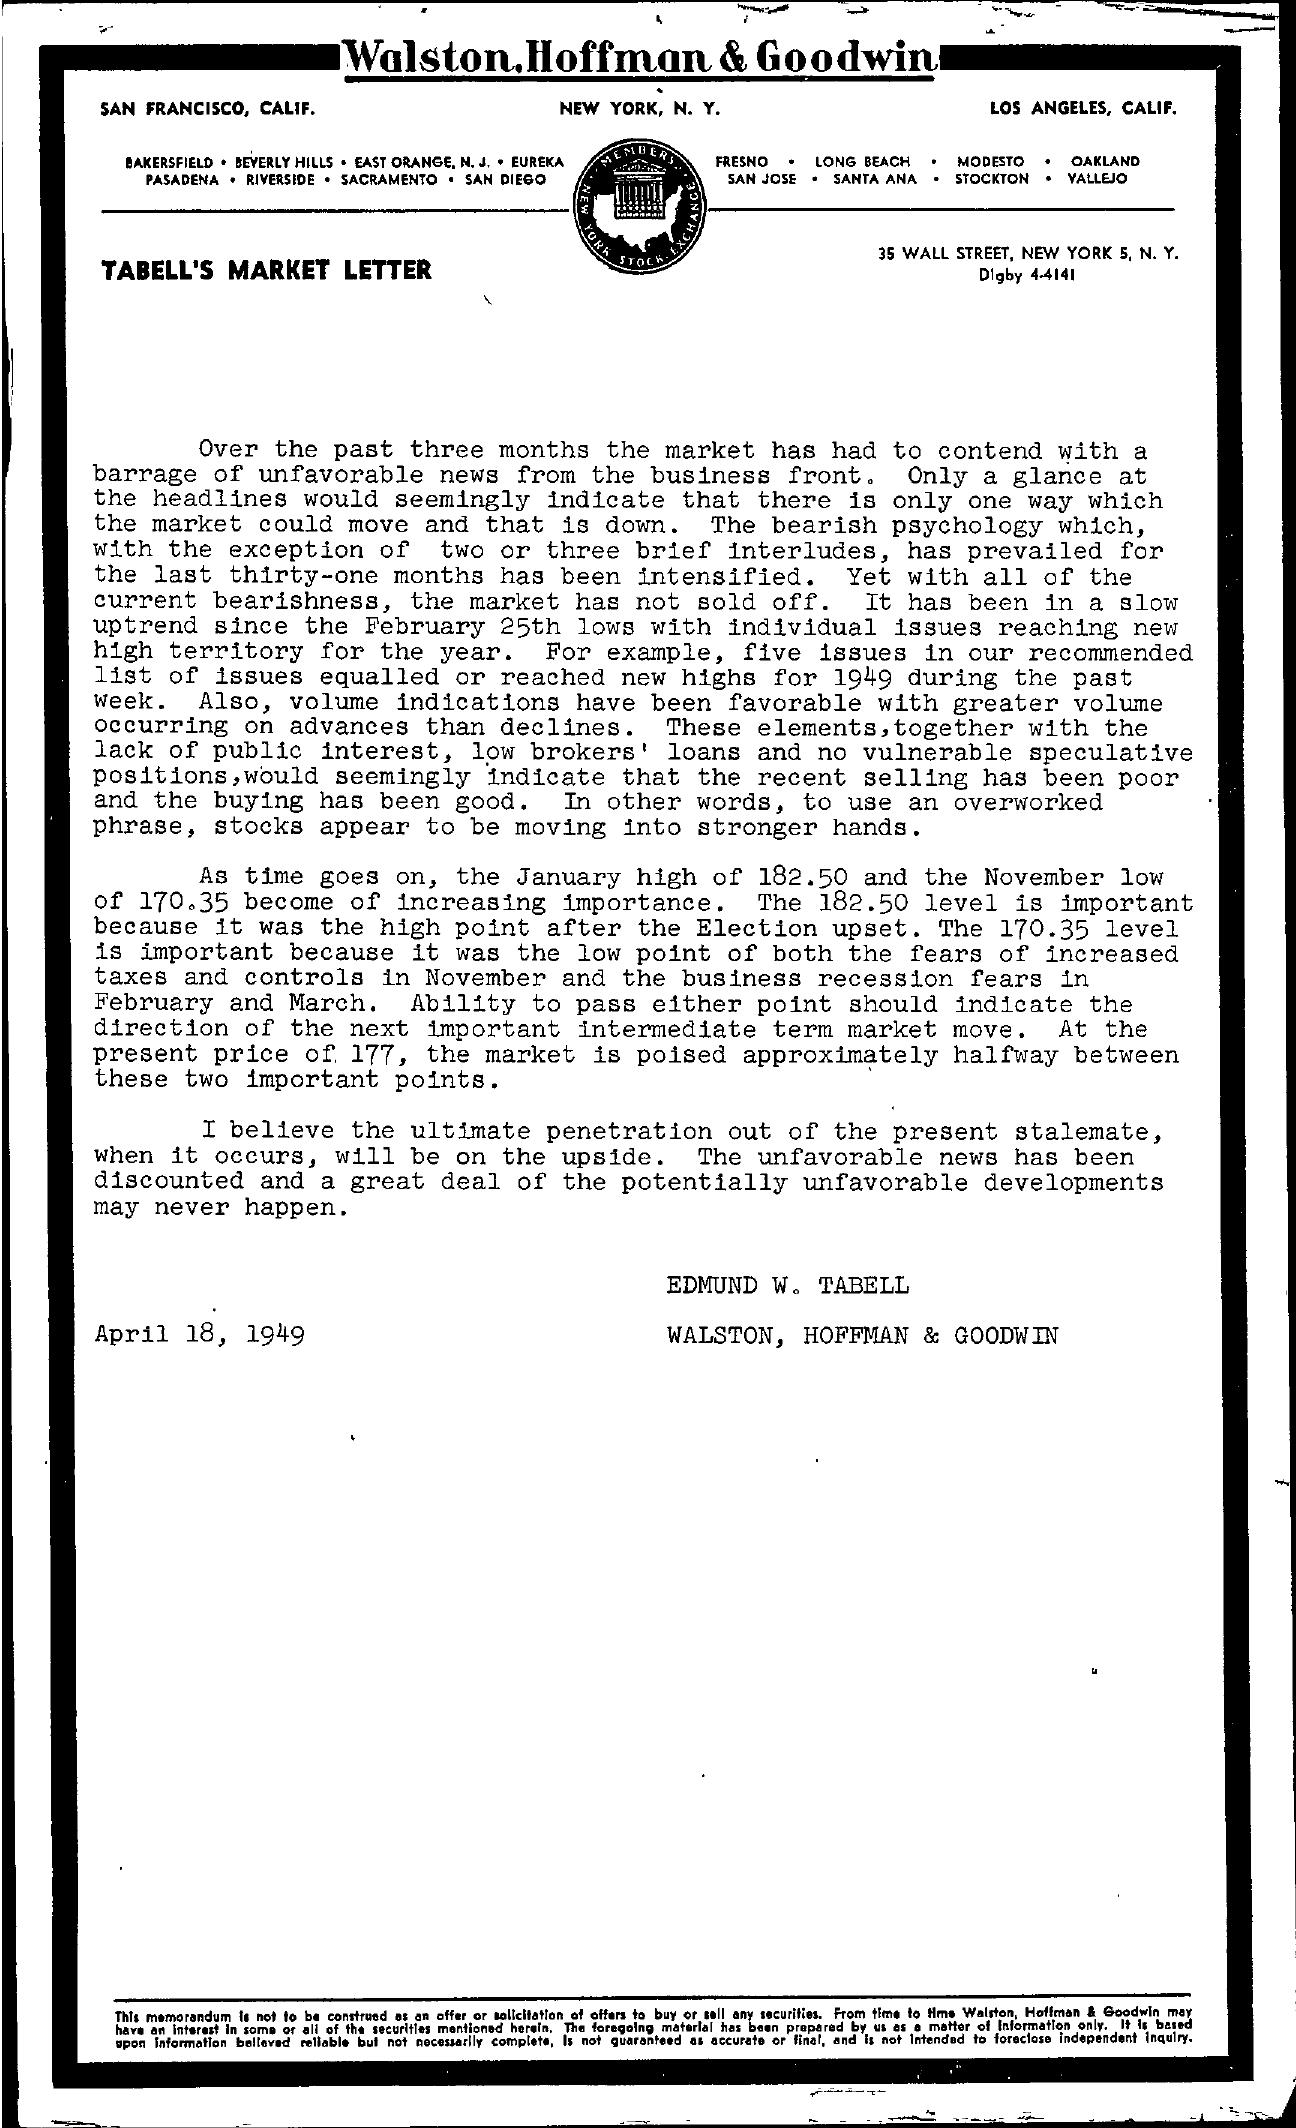 Tabell's Market Letter - April 18, 1949